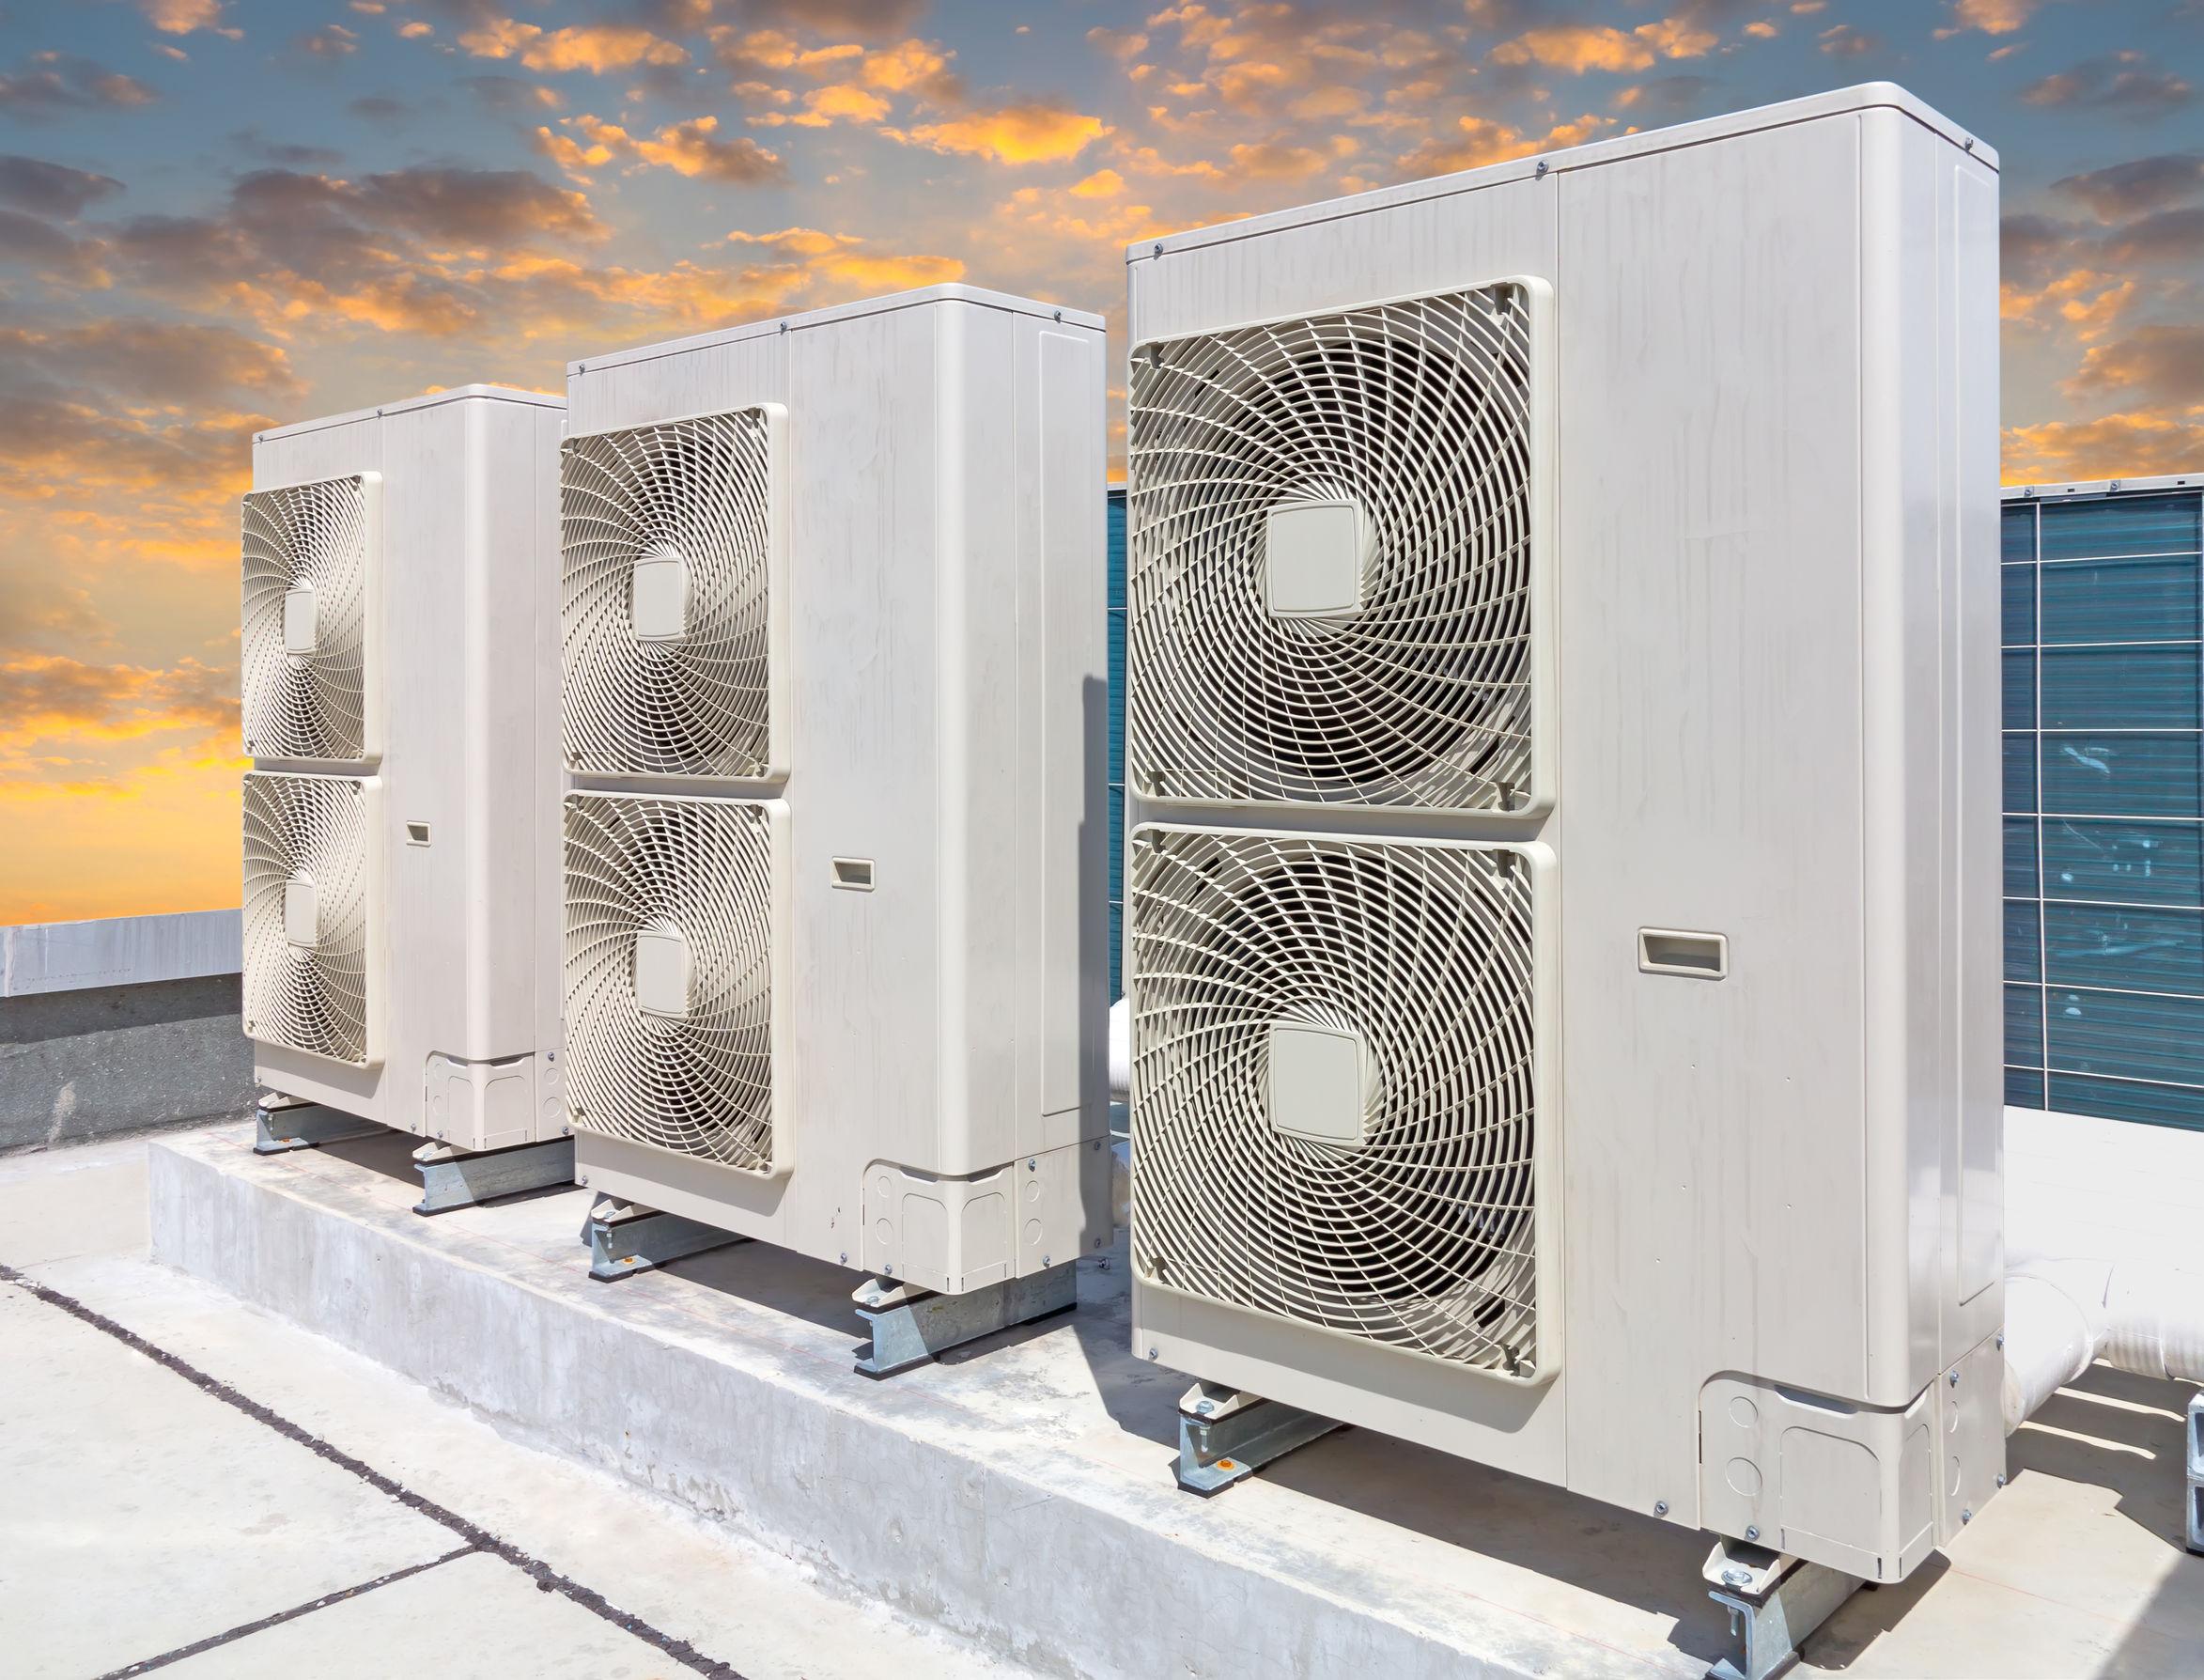 Klimaechnik